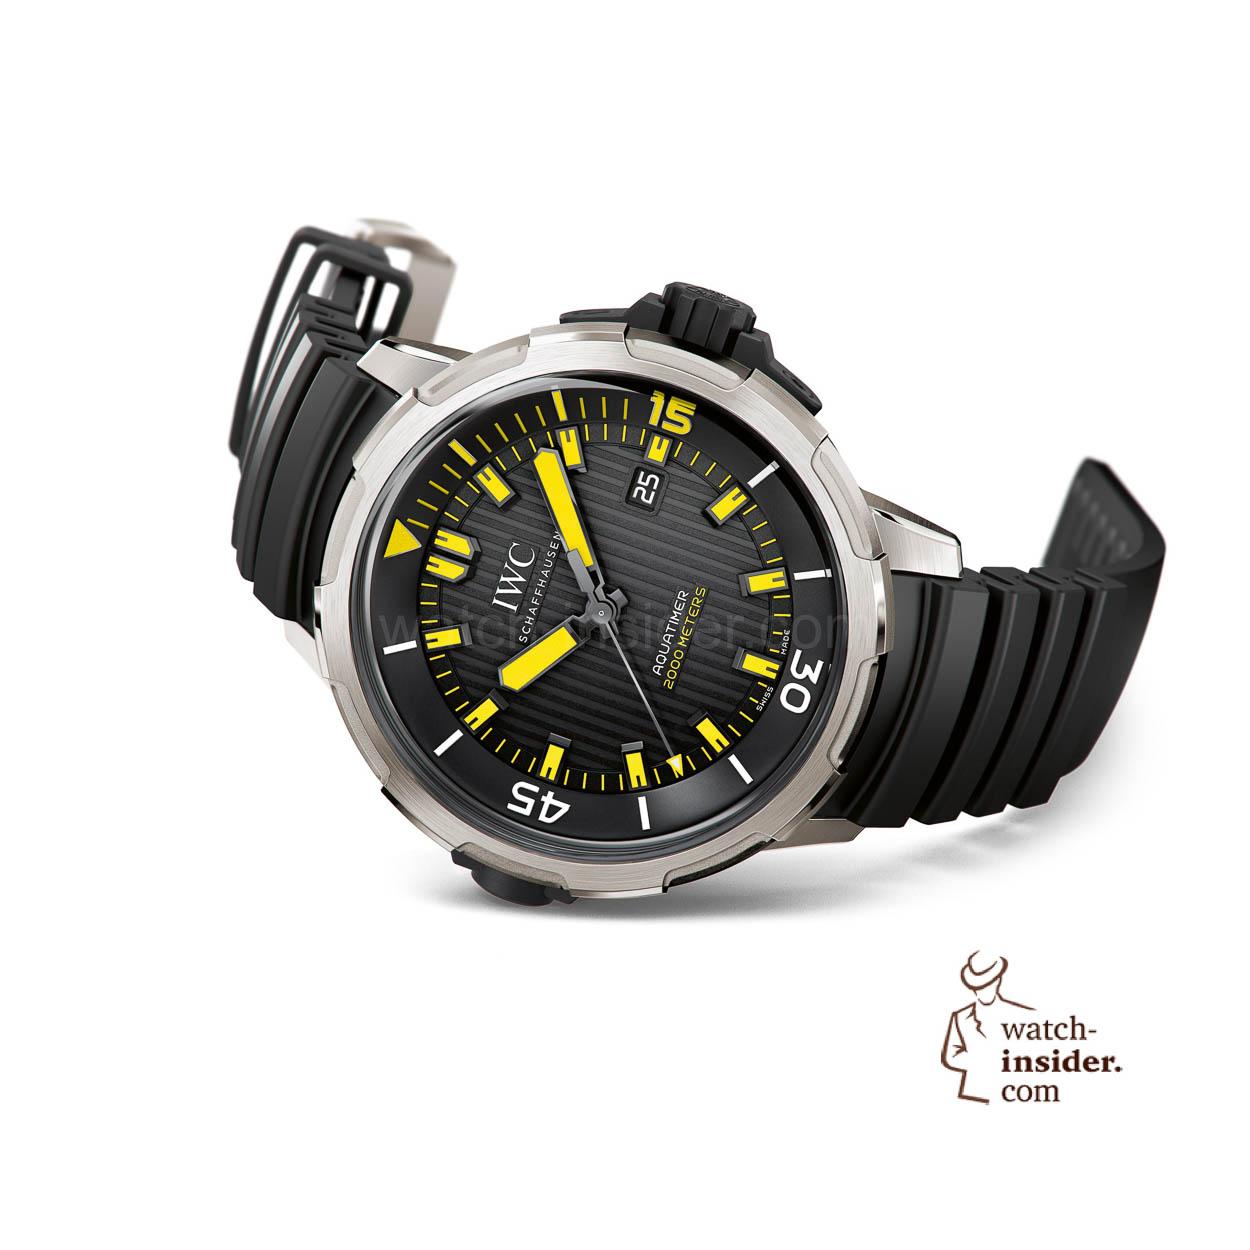 ed6808fbadf Let me show you three new IWC Schaffhausen Aquatimer diver´s watches